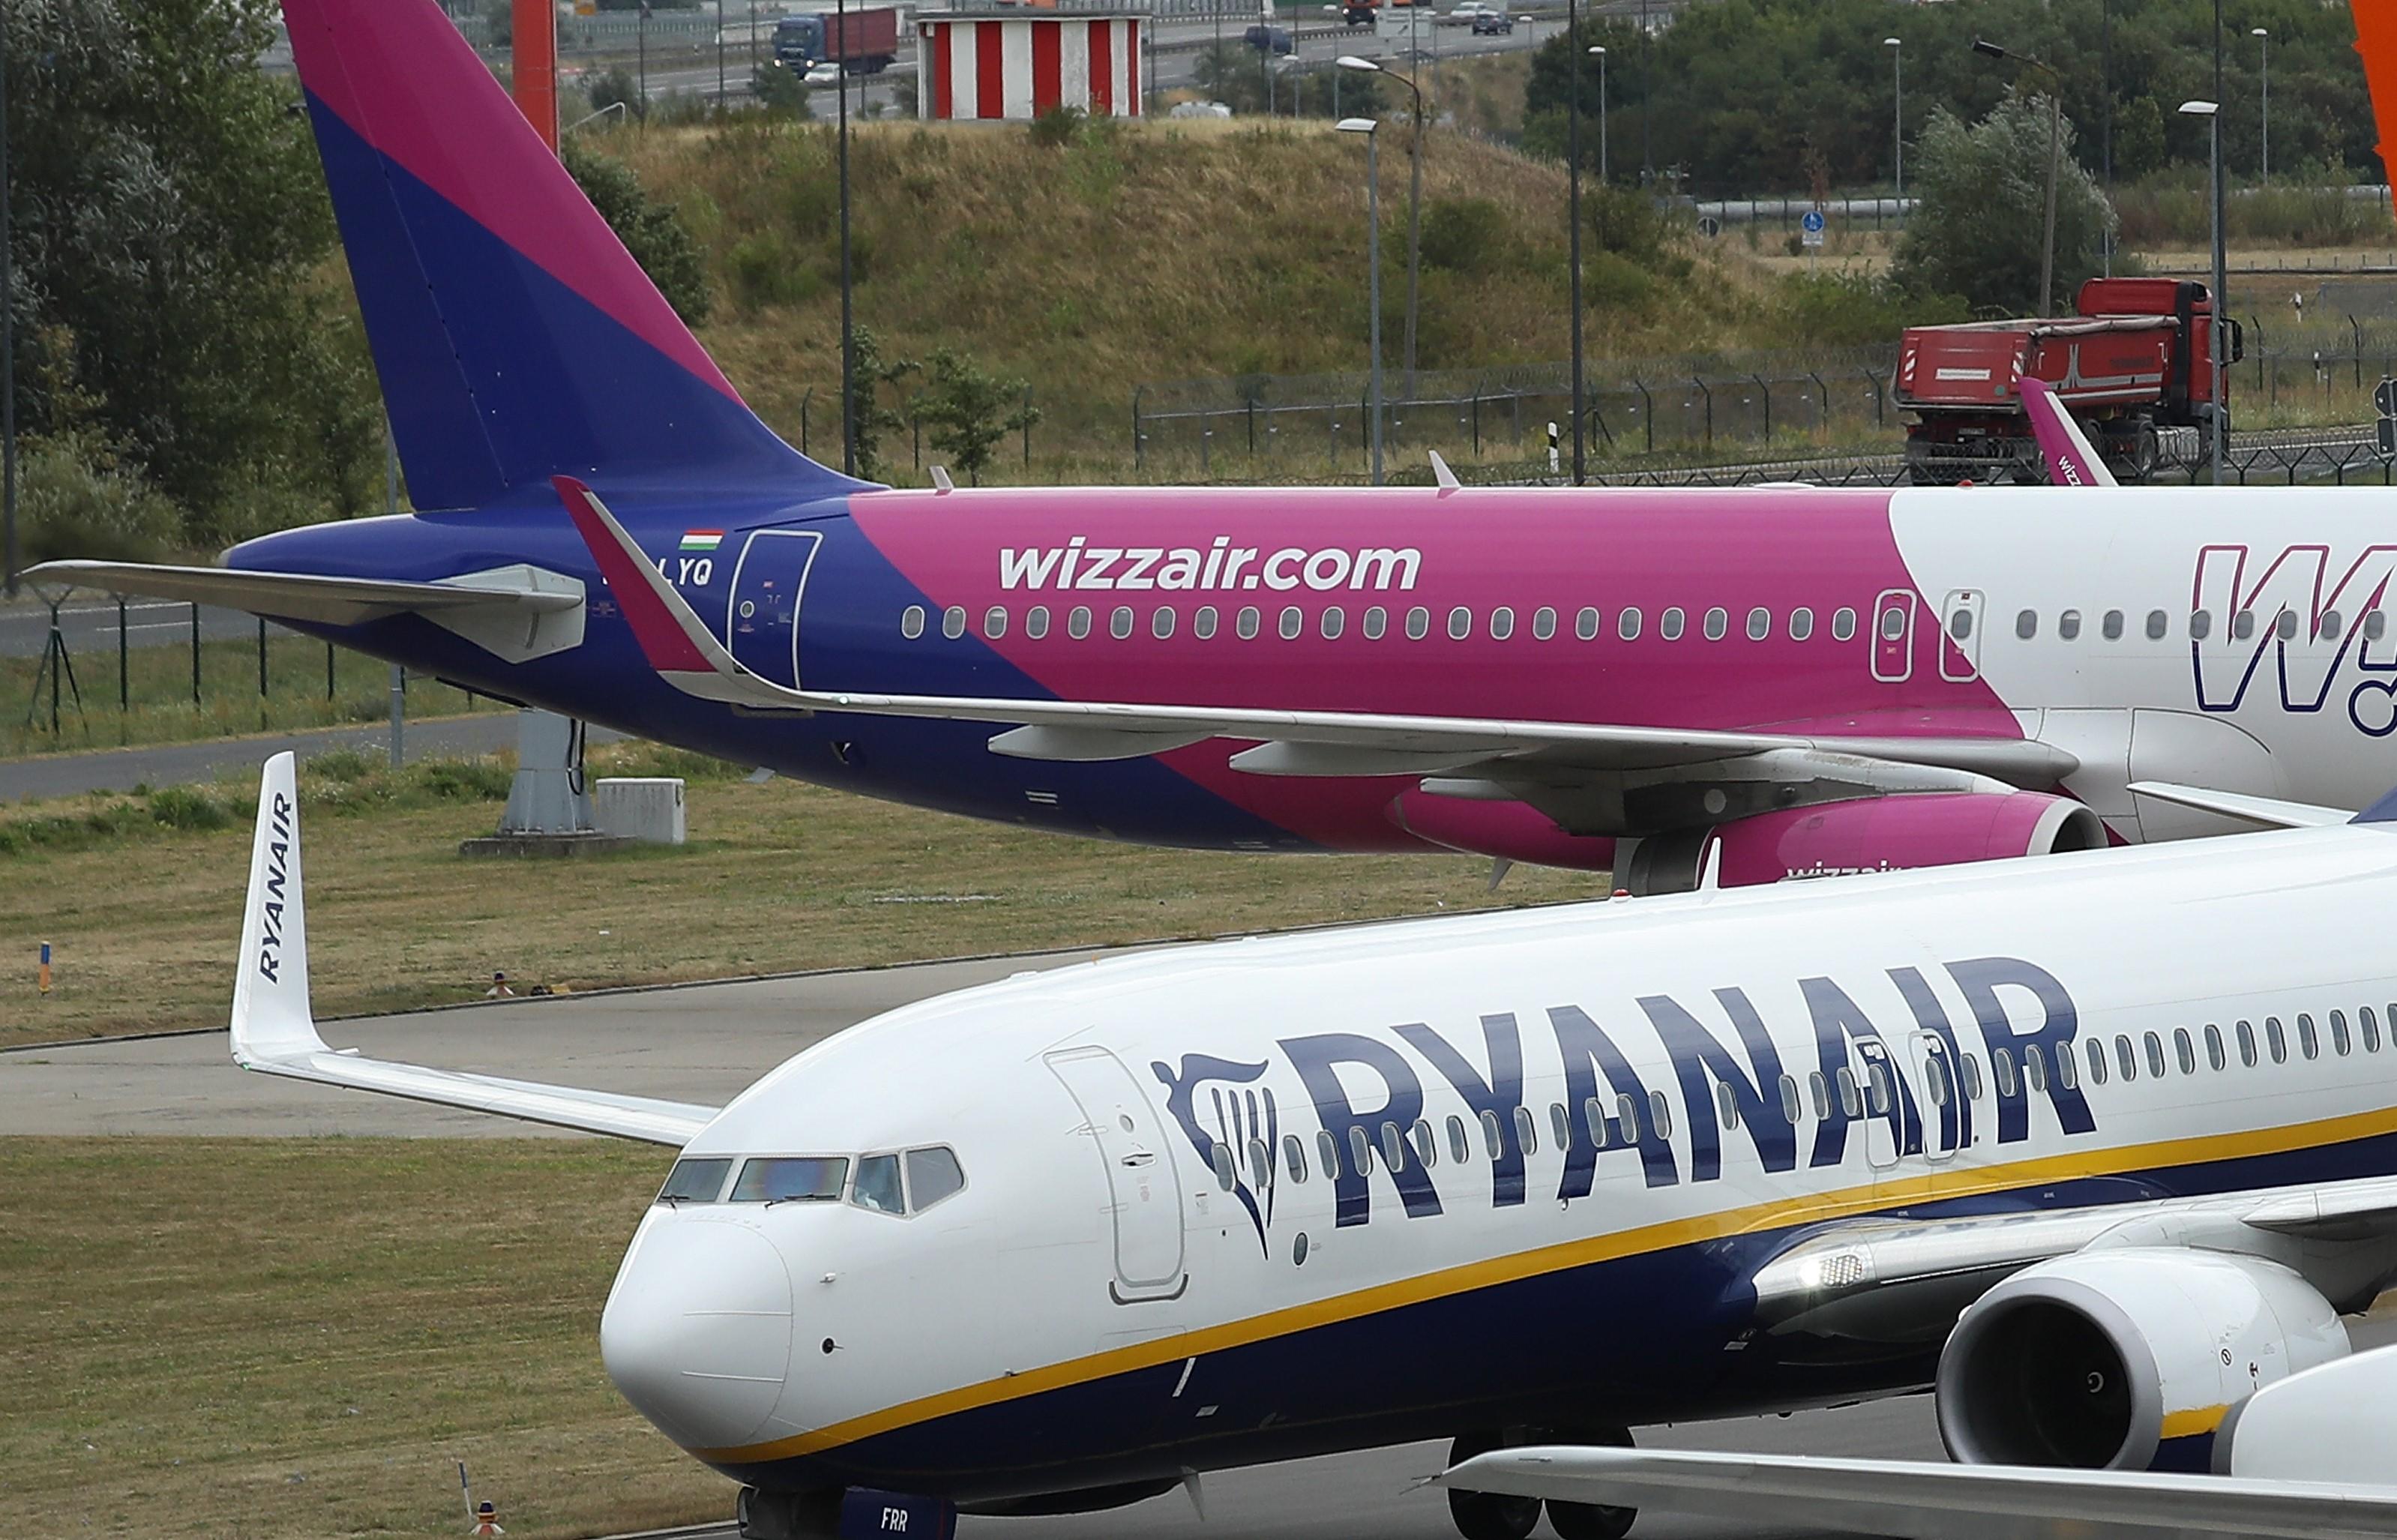 Ryanair Wizz Air First Mover Advantage In European Aviation S Reset Capa